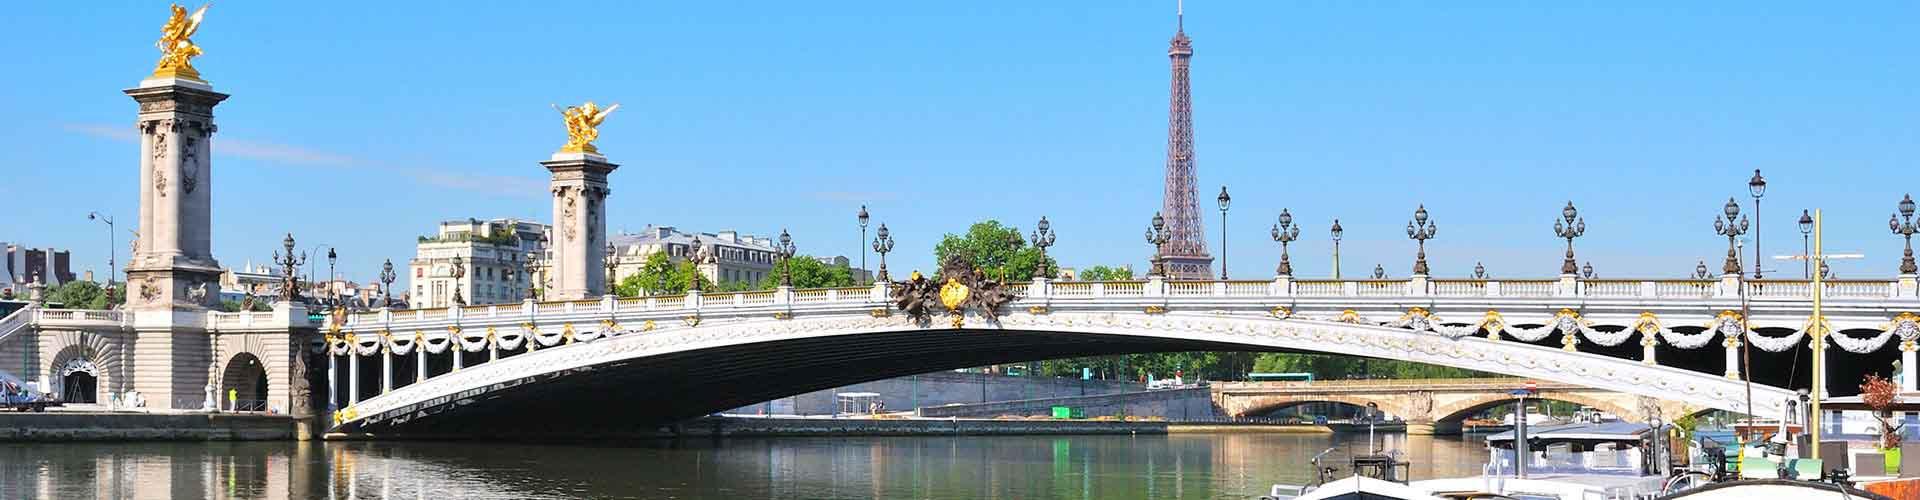 París - Albergues Juveniles cerca a Pont Alexandre III. Mapas de París, Fotos y Comentarios para cada Albergue Juvenil en París.